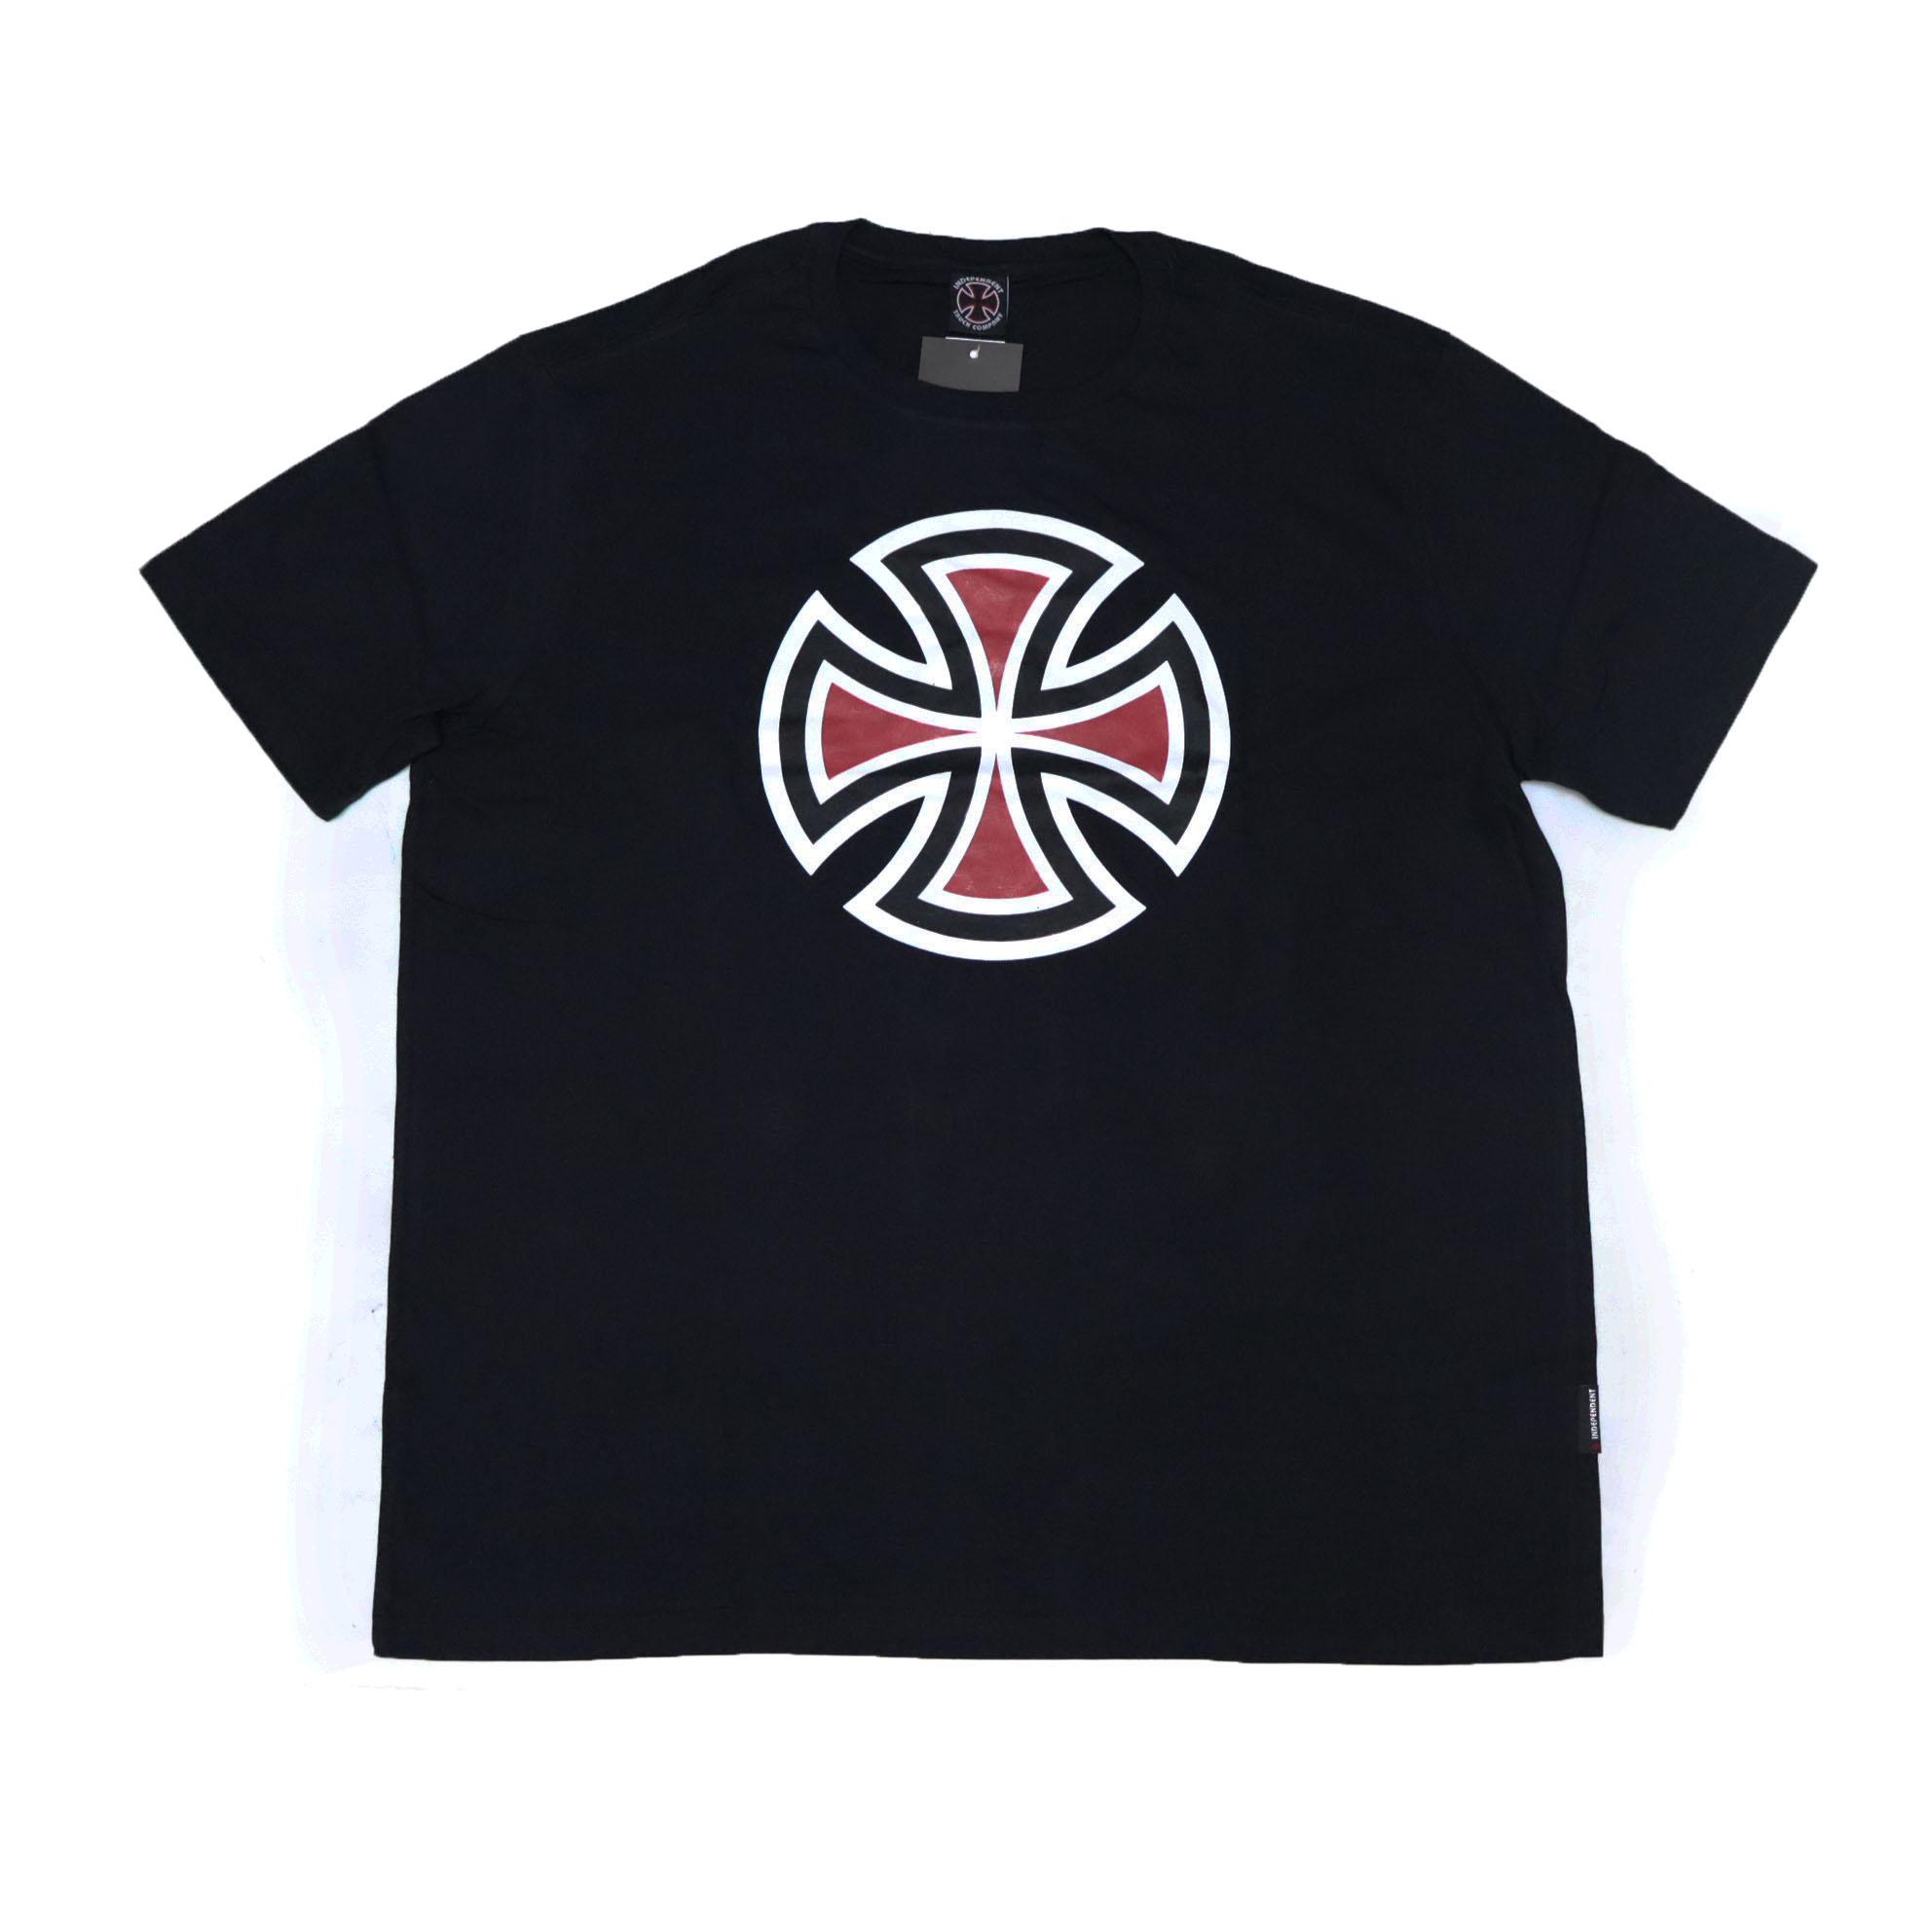 Camiseta Independent 4 Tier Cross 3 Color - Preto